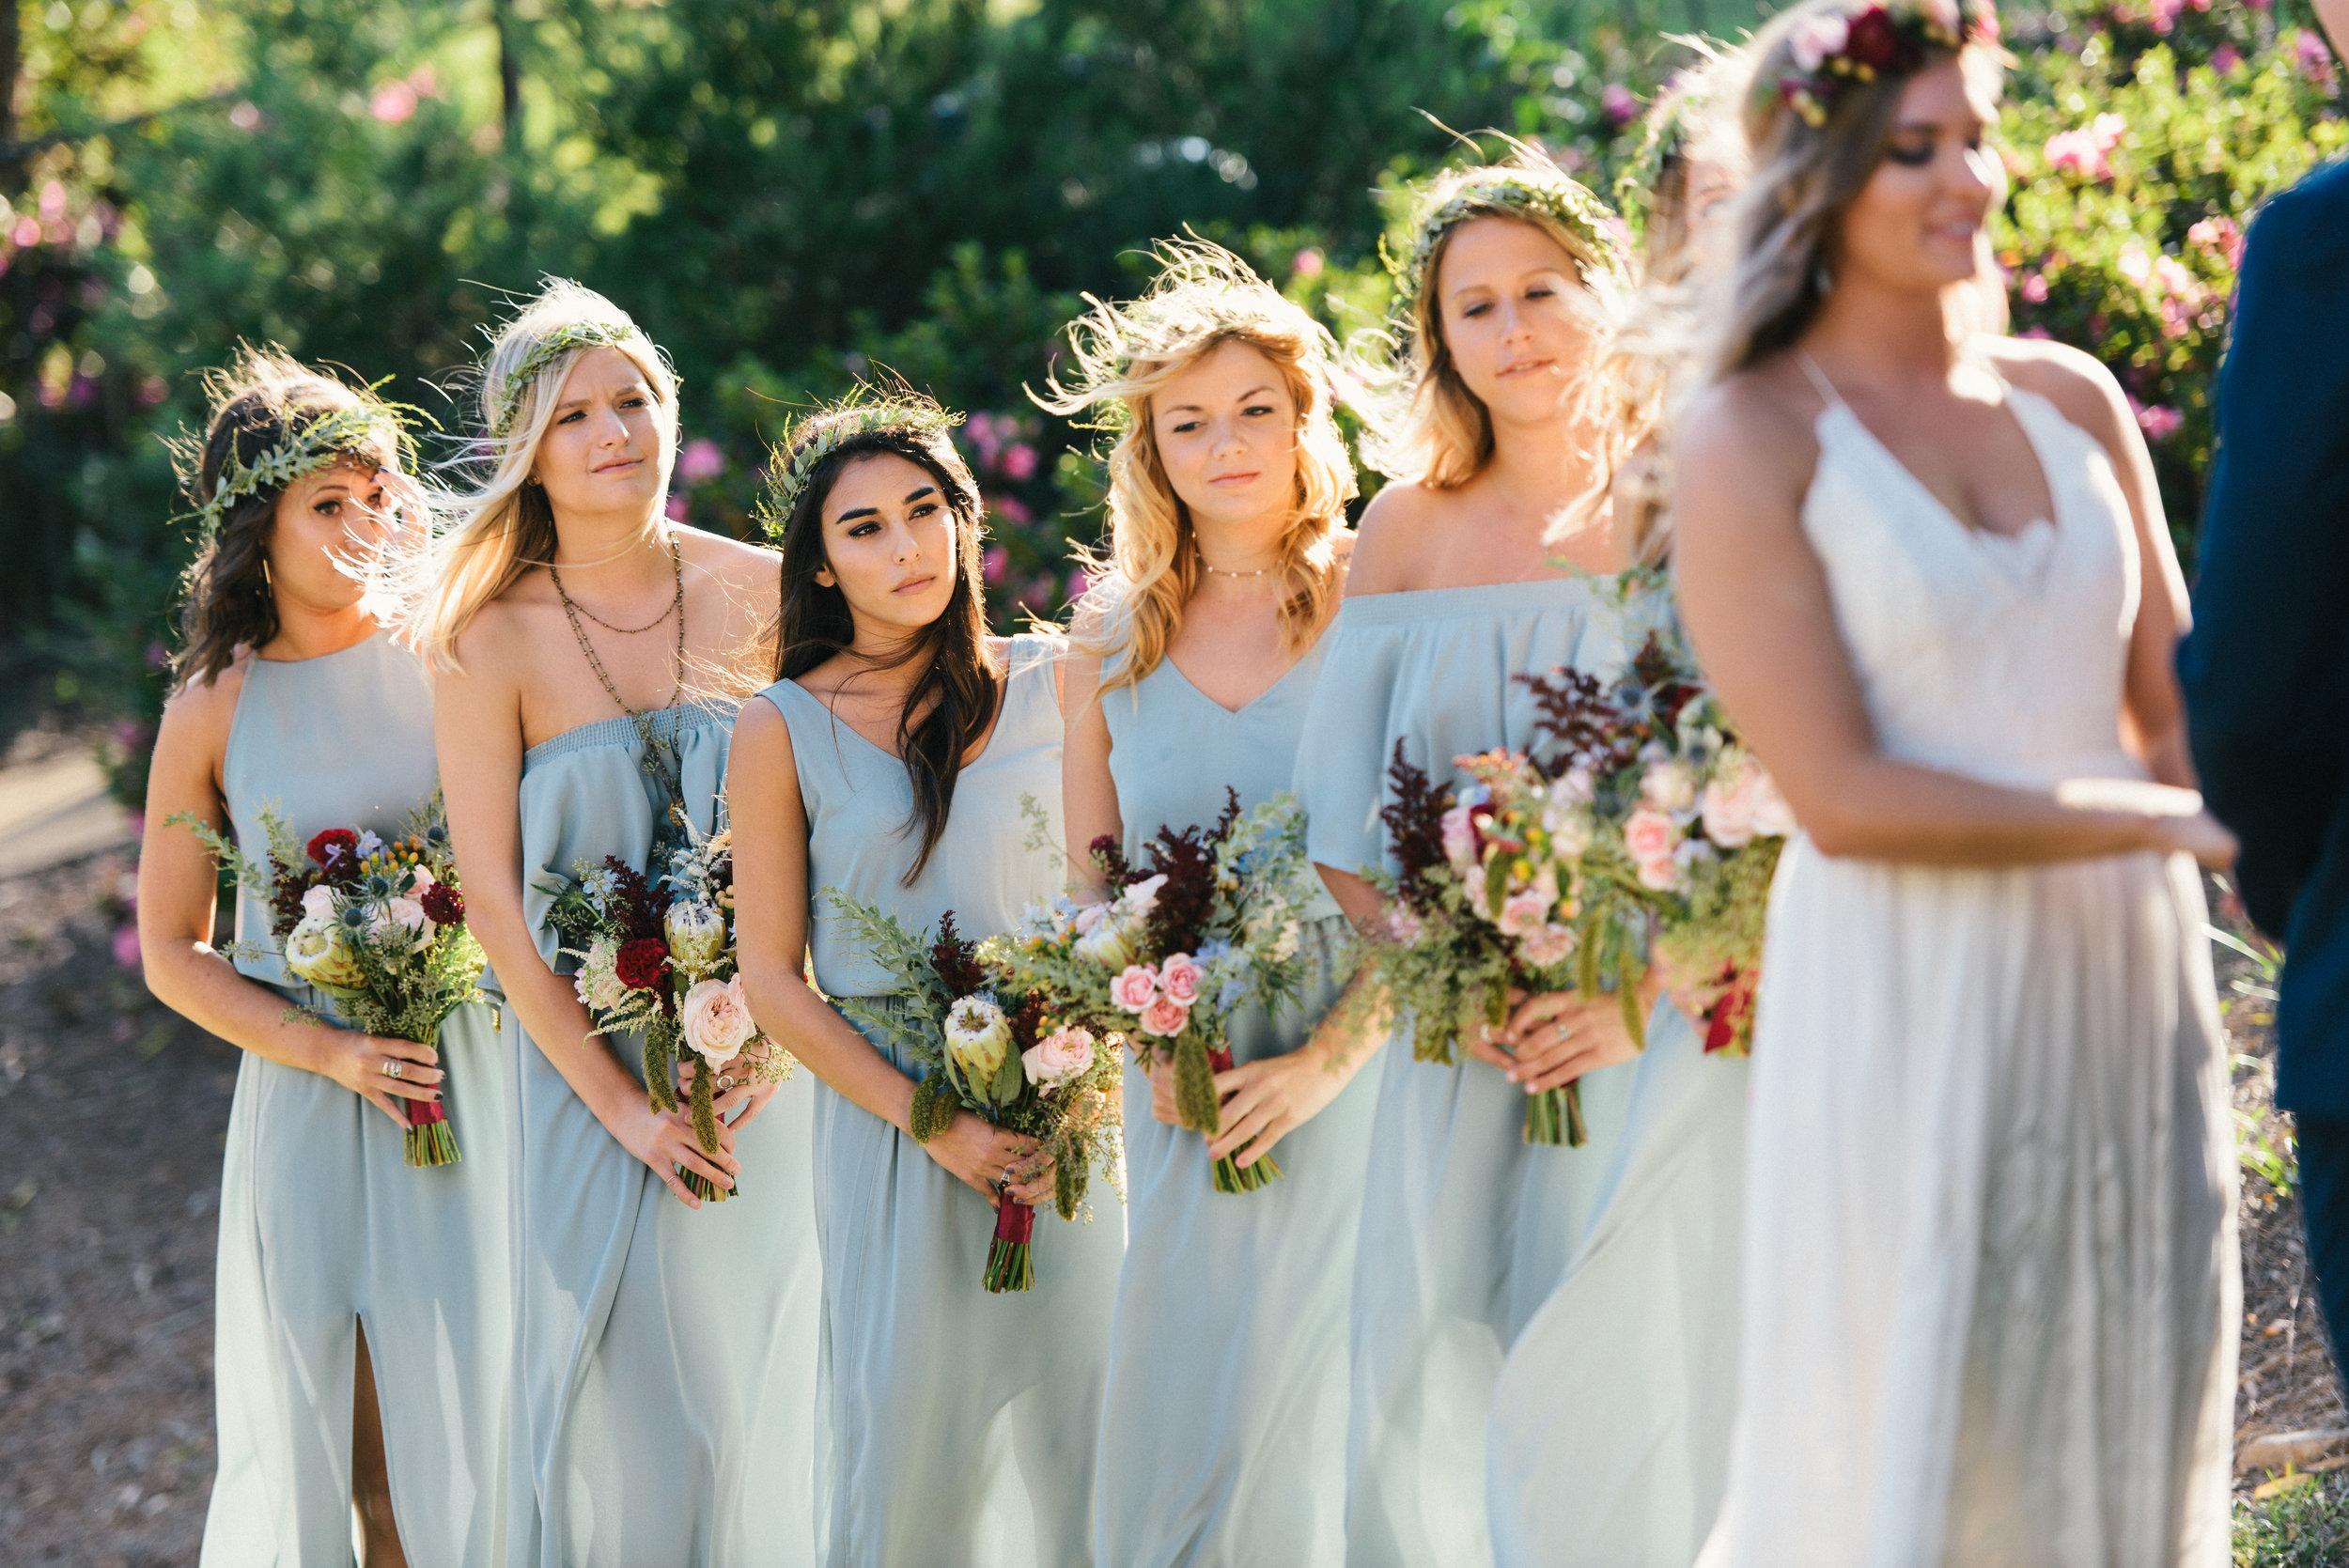 kristin-and-peter-atlanta-georgia-wedding-october-8th-2016 (400 of 1068).jpg